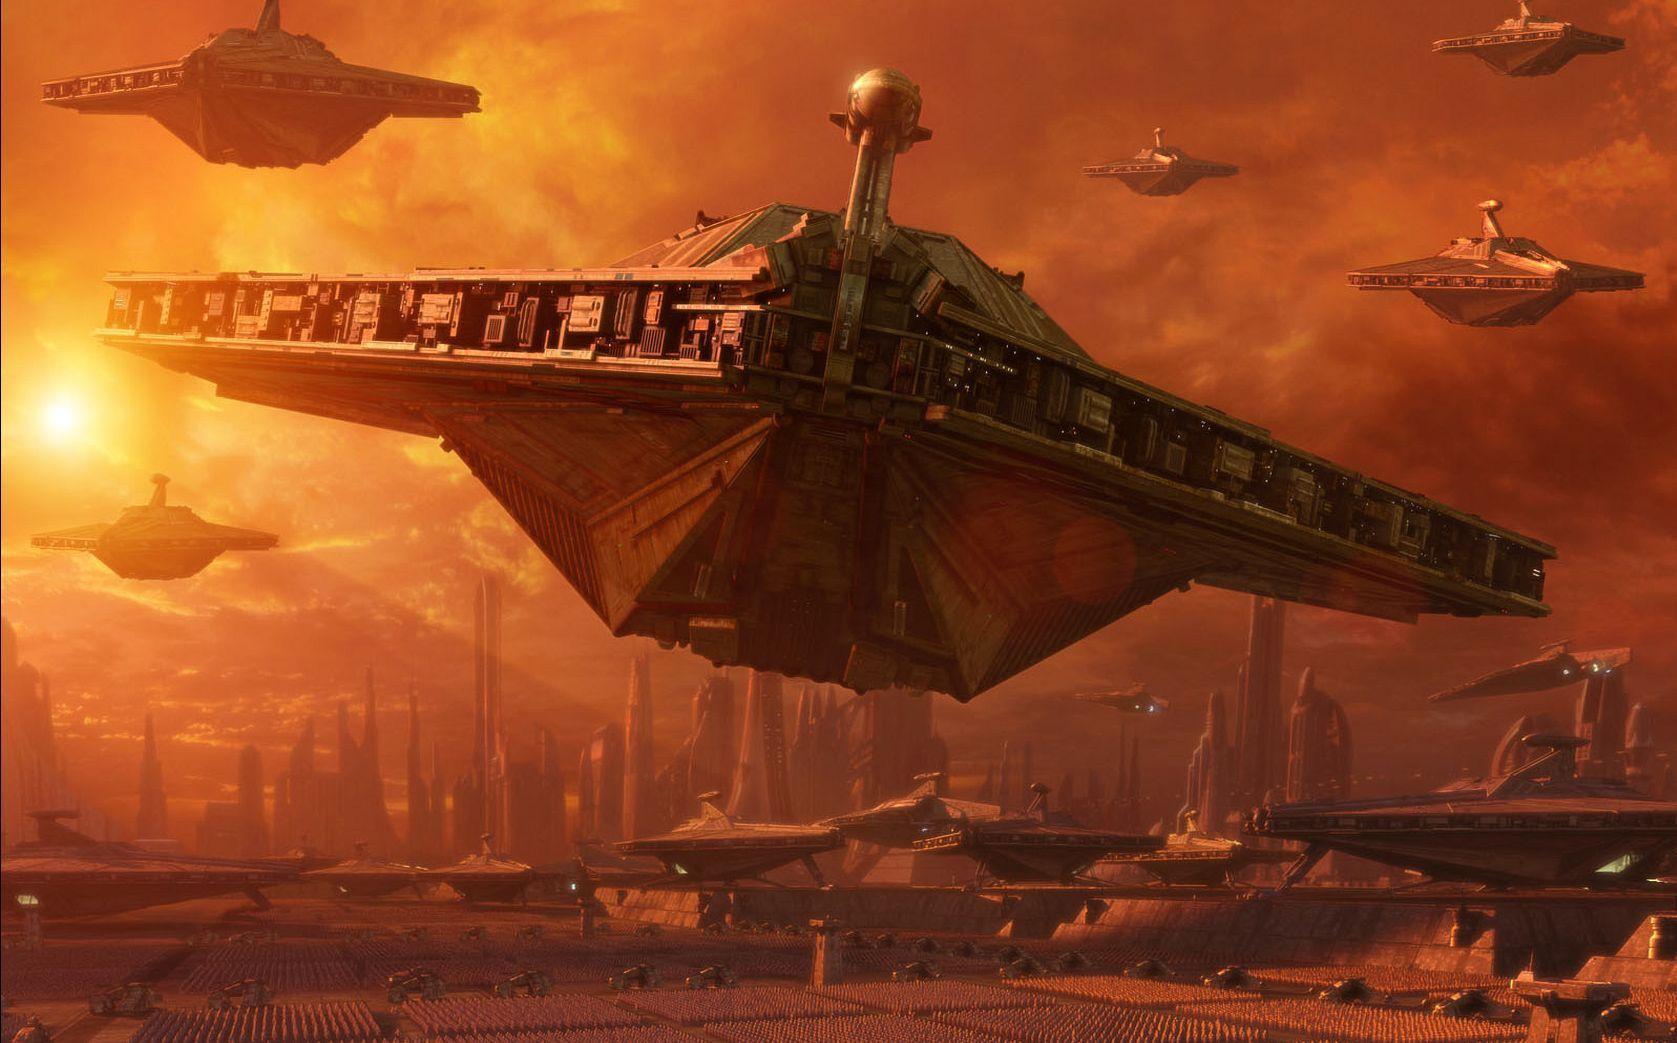 Phone Wallpaper Hd Ultimate Star Wars Star Wars Wallpaper Star Wars Episode Ii